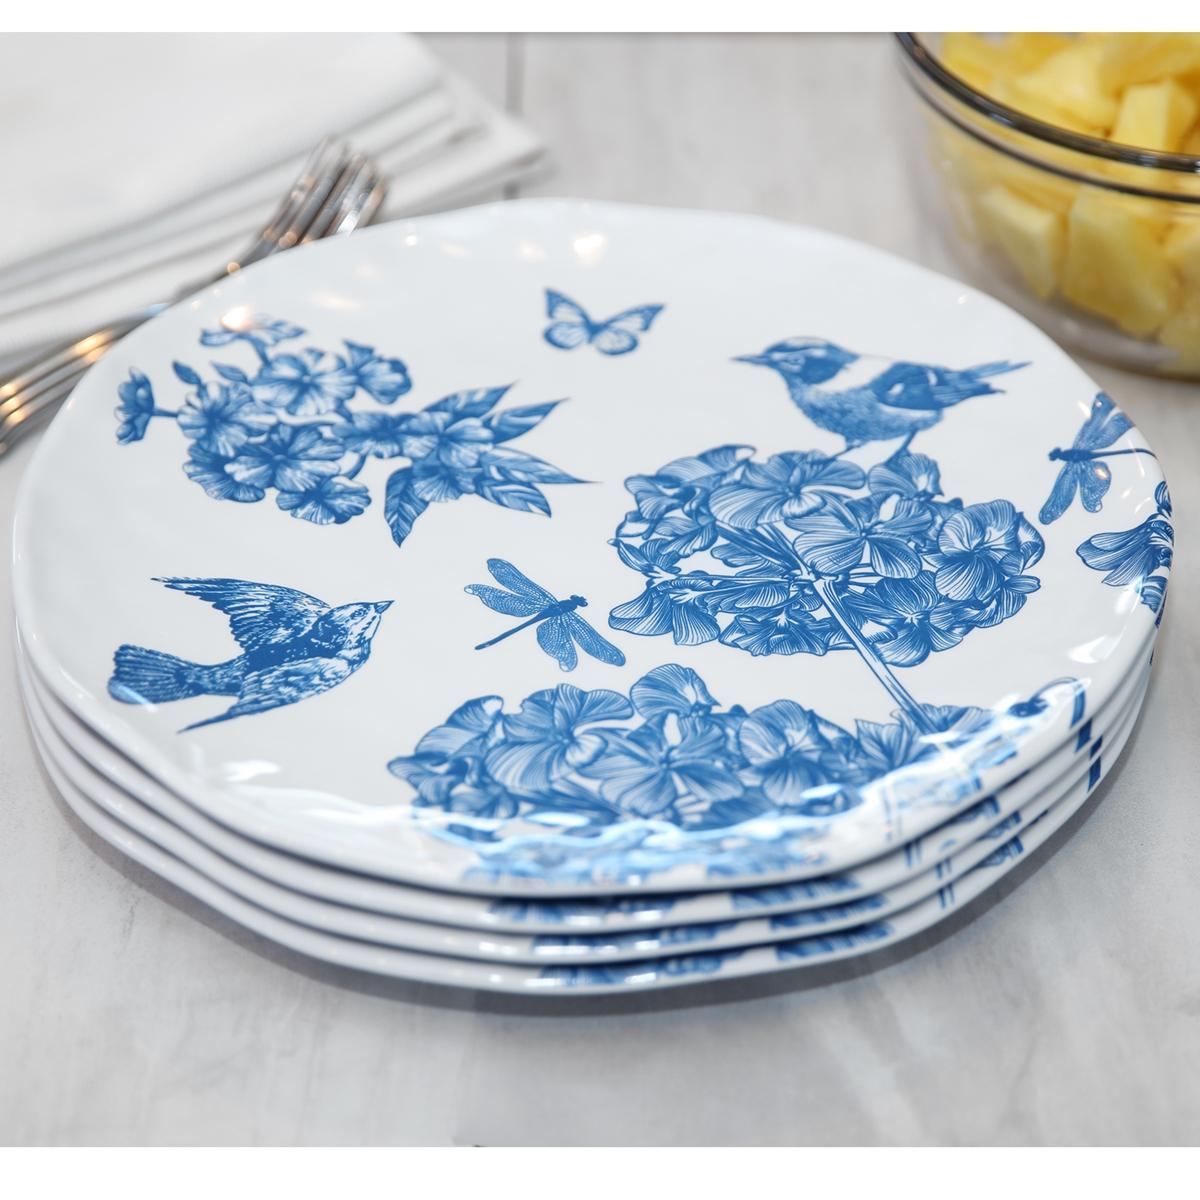 Indigo Dinner Plates